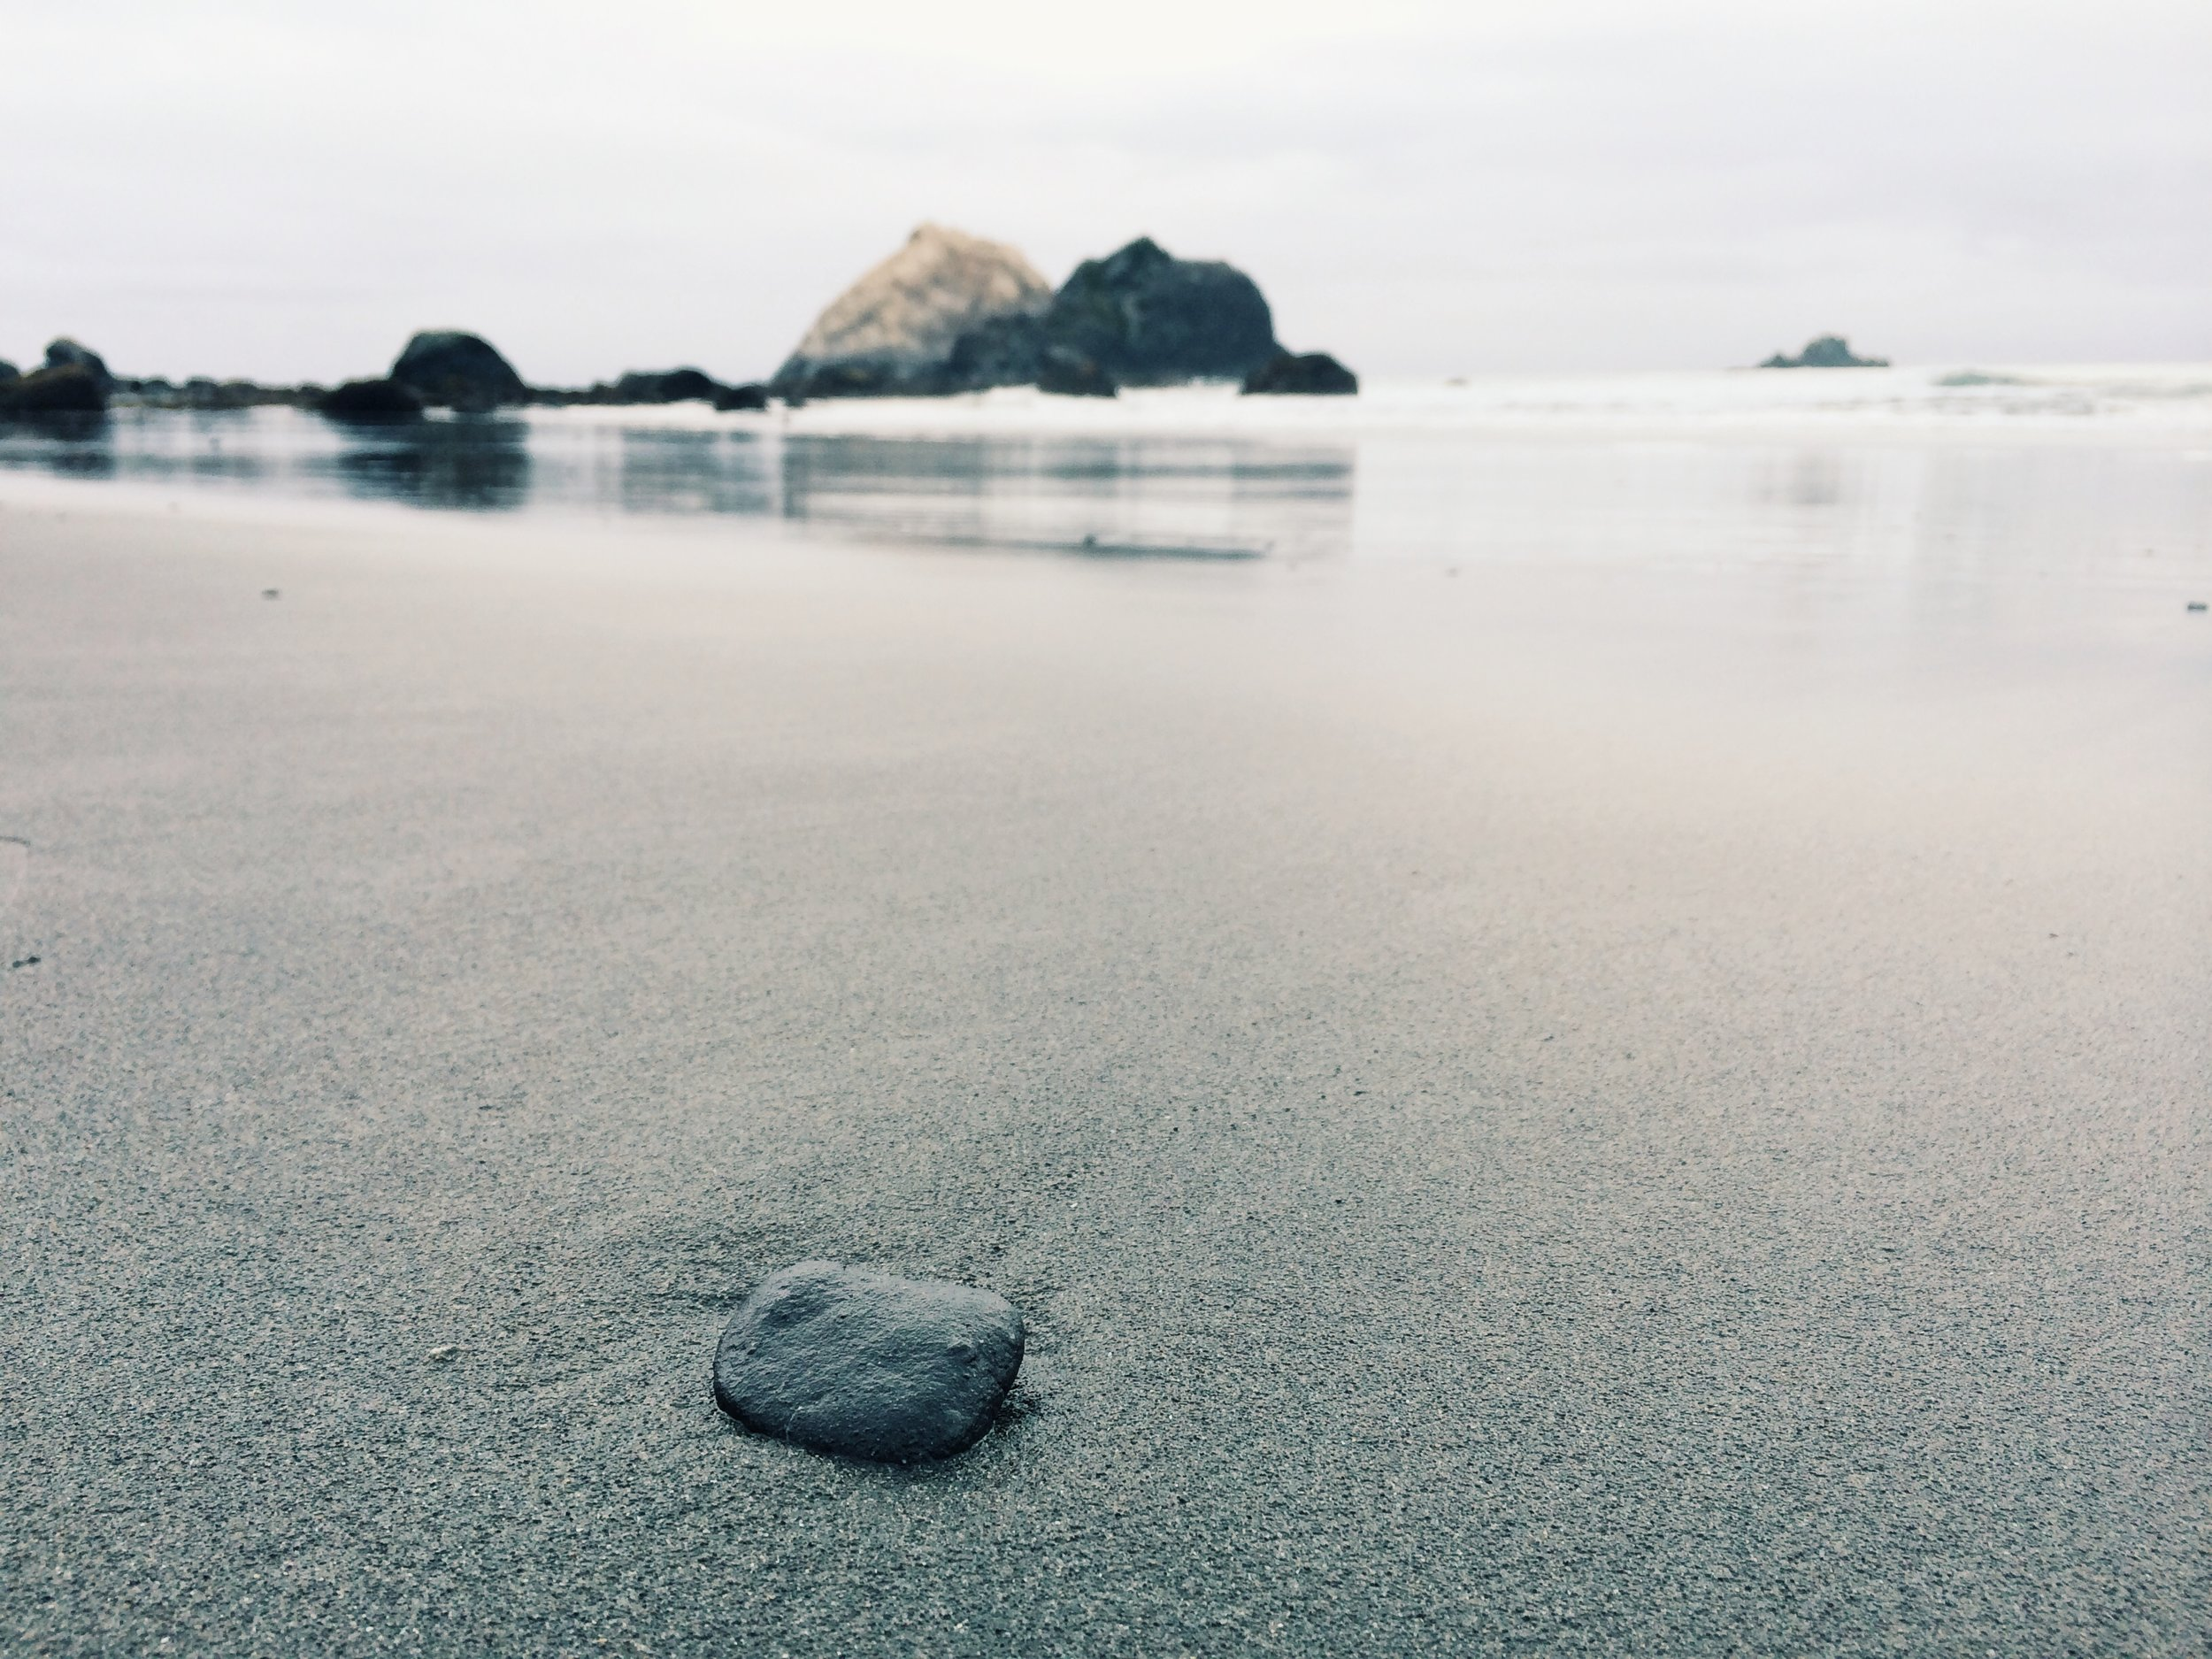 Neutral Calmness